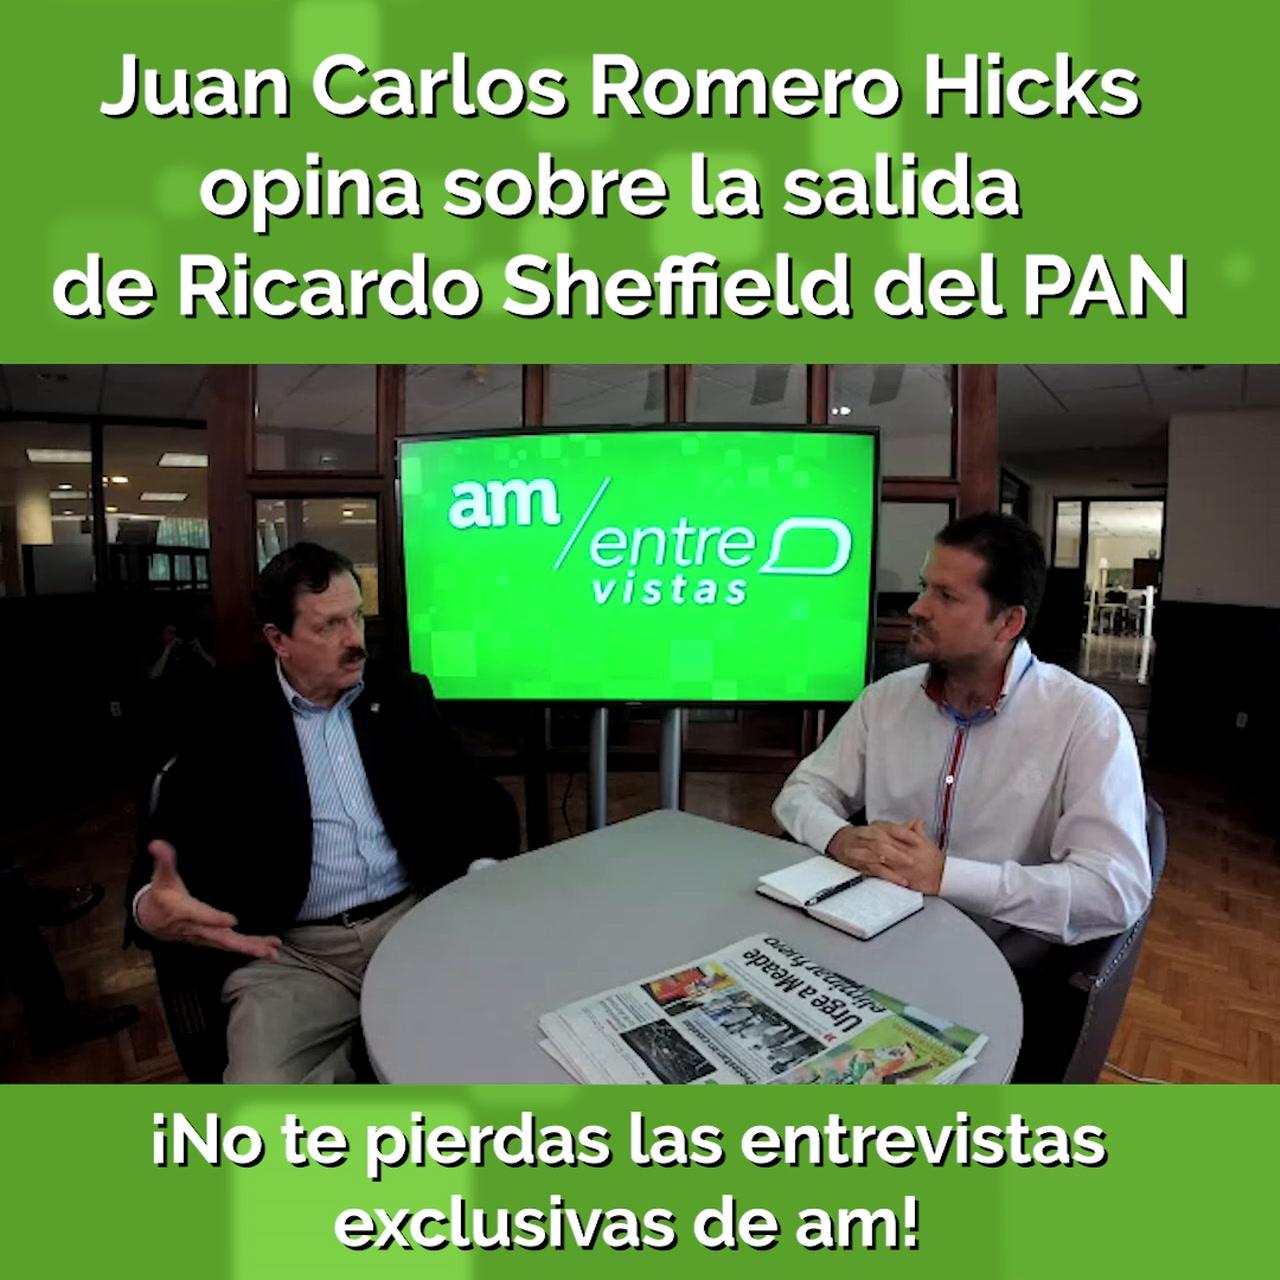 Romero Hicks opina sobre la salida de Sheffield del PAN